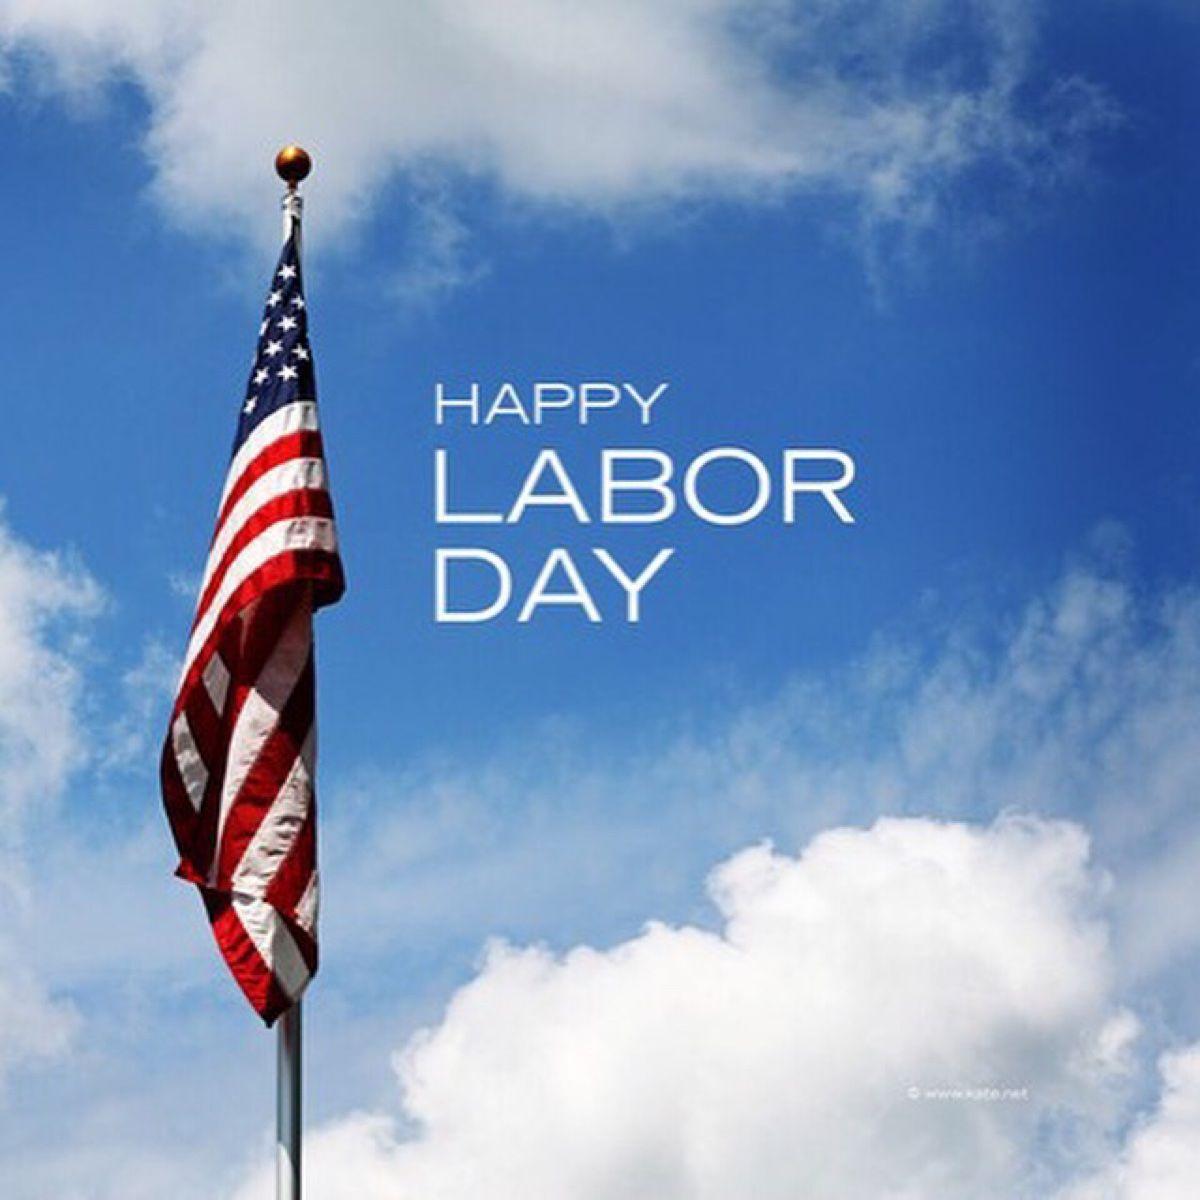 #happy #laborday